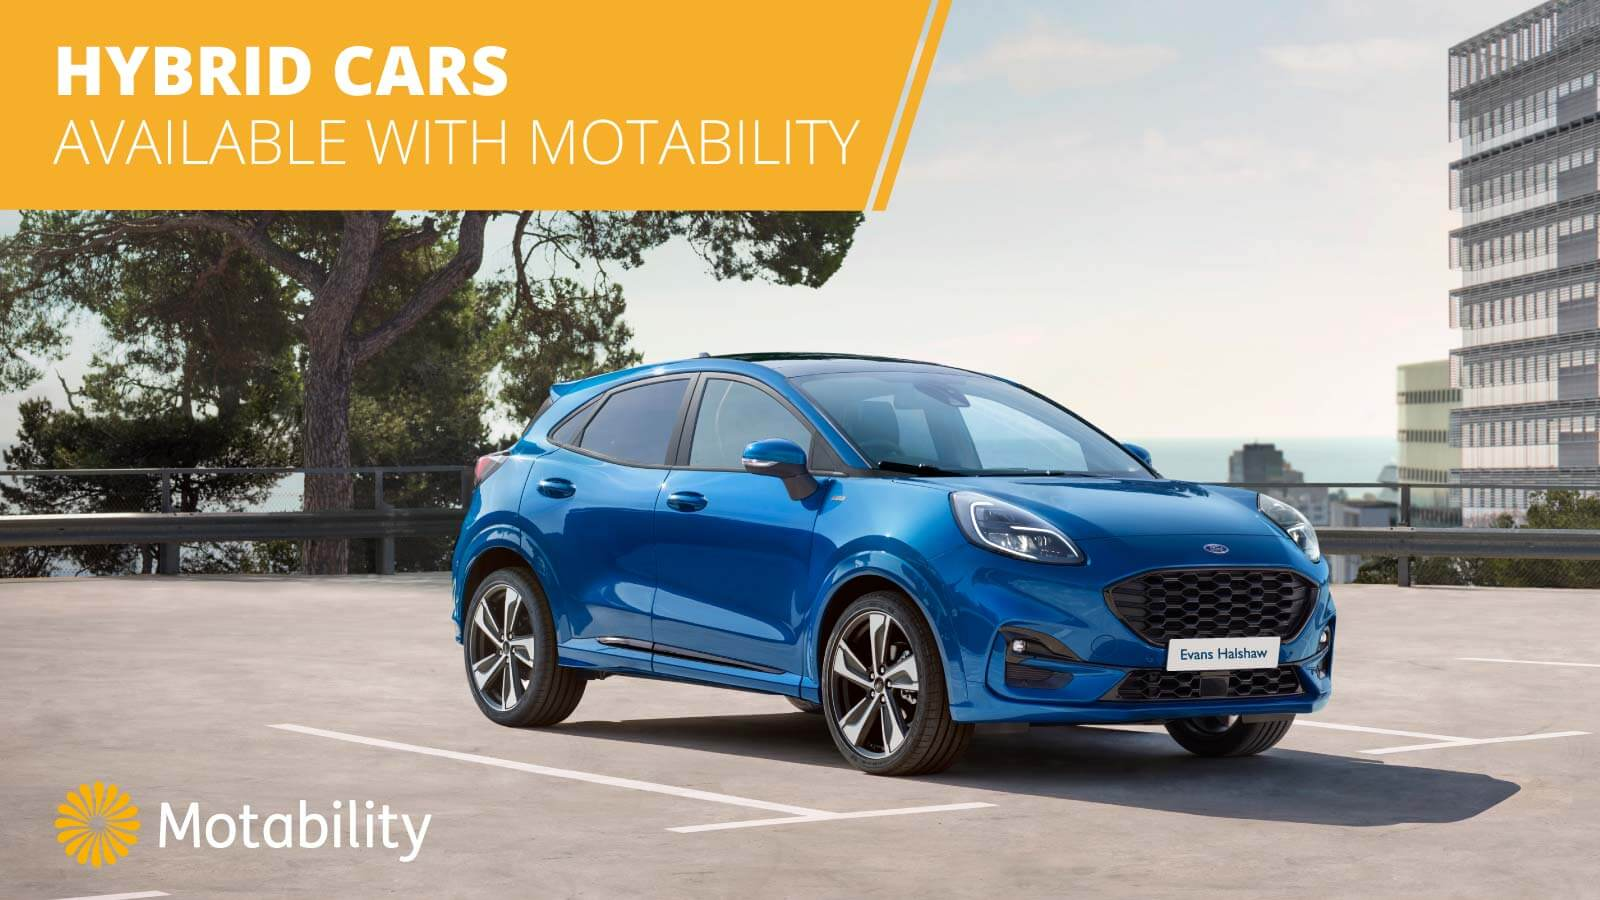 Hybrid Motability Cars